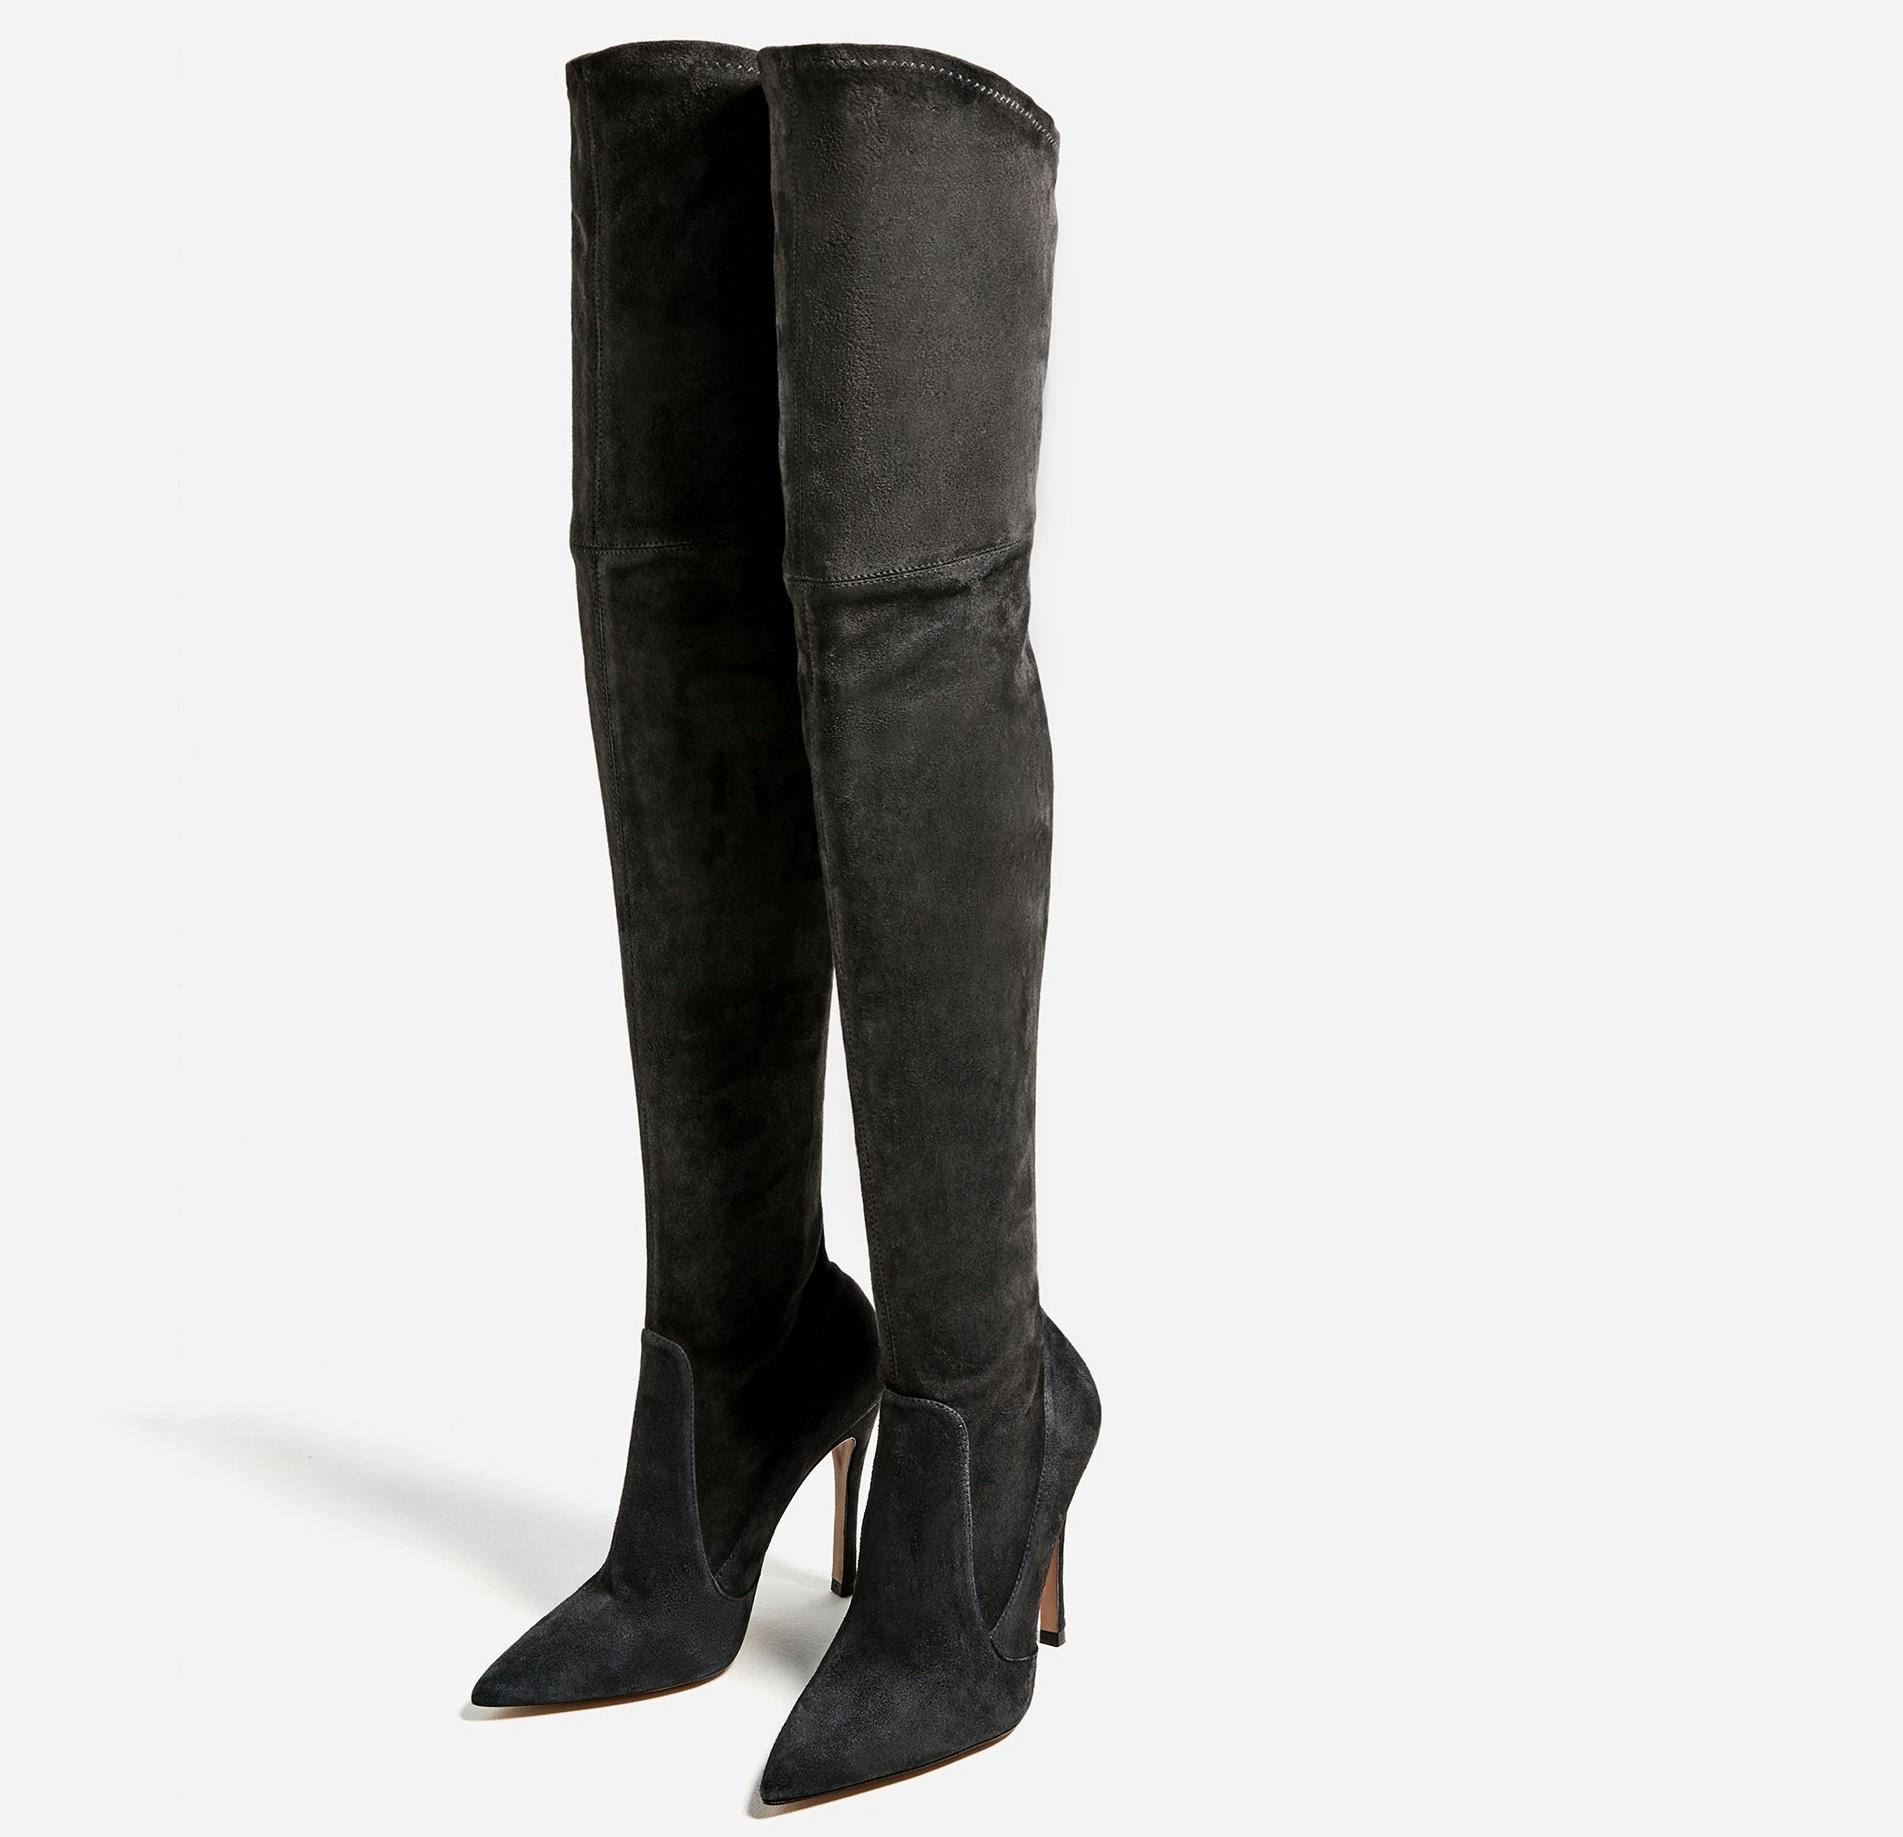 Stivali cuissard Zara